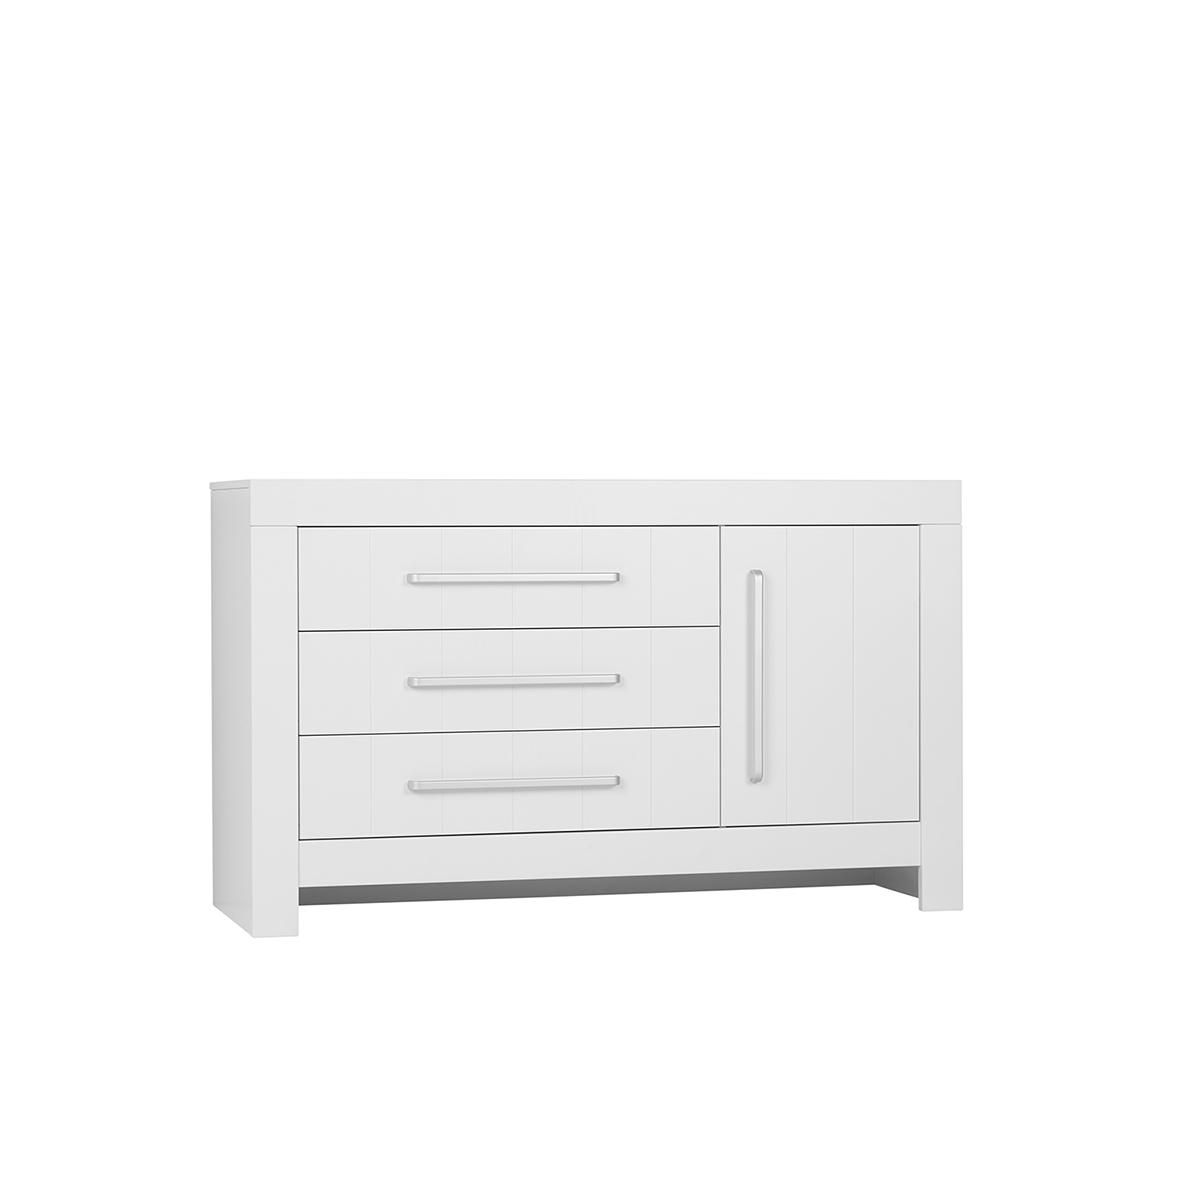 Pinio - Commode XL Calmo - Blanc